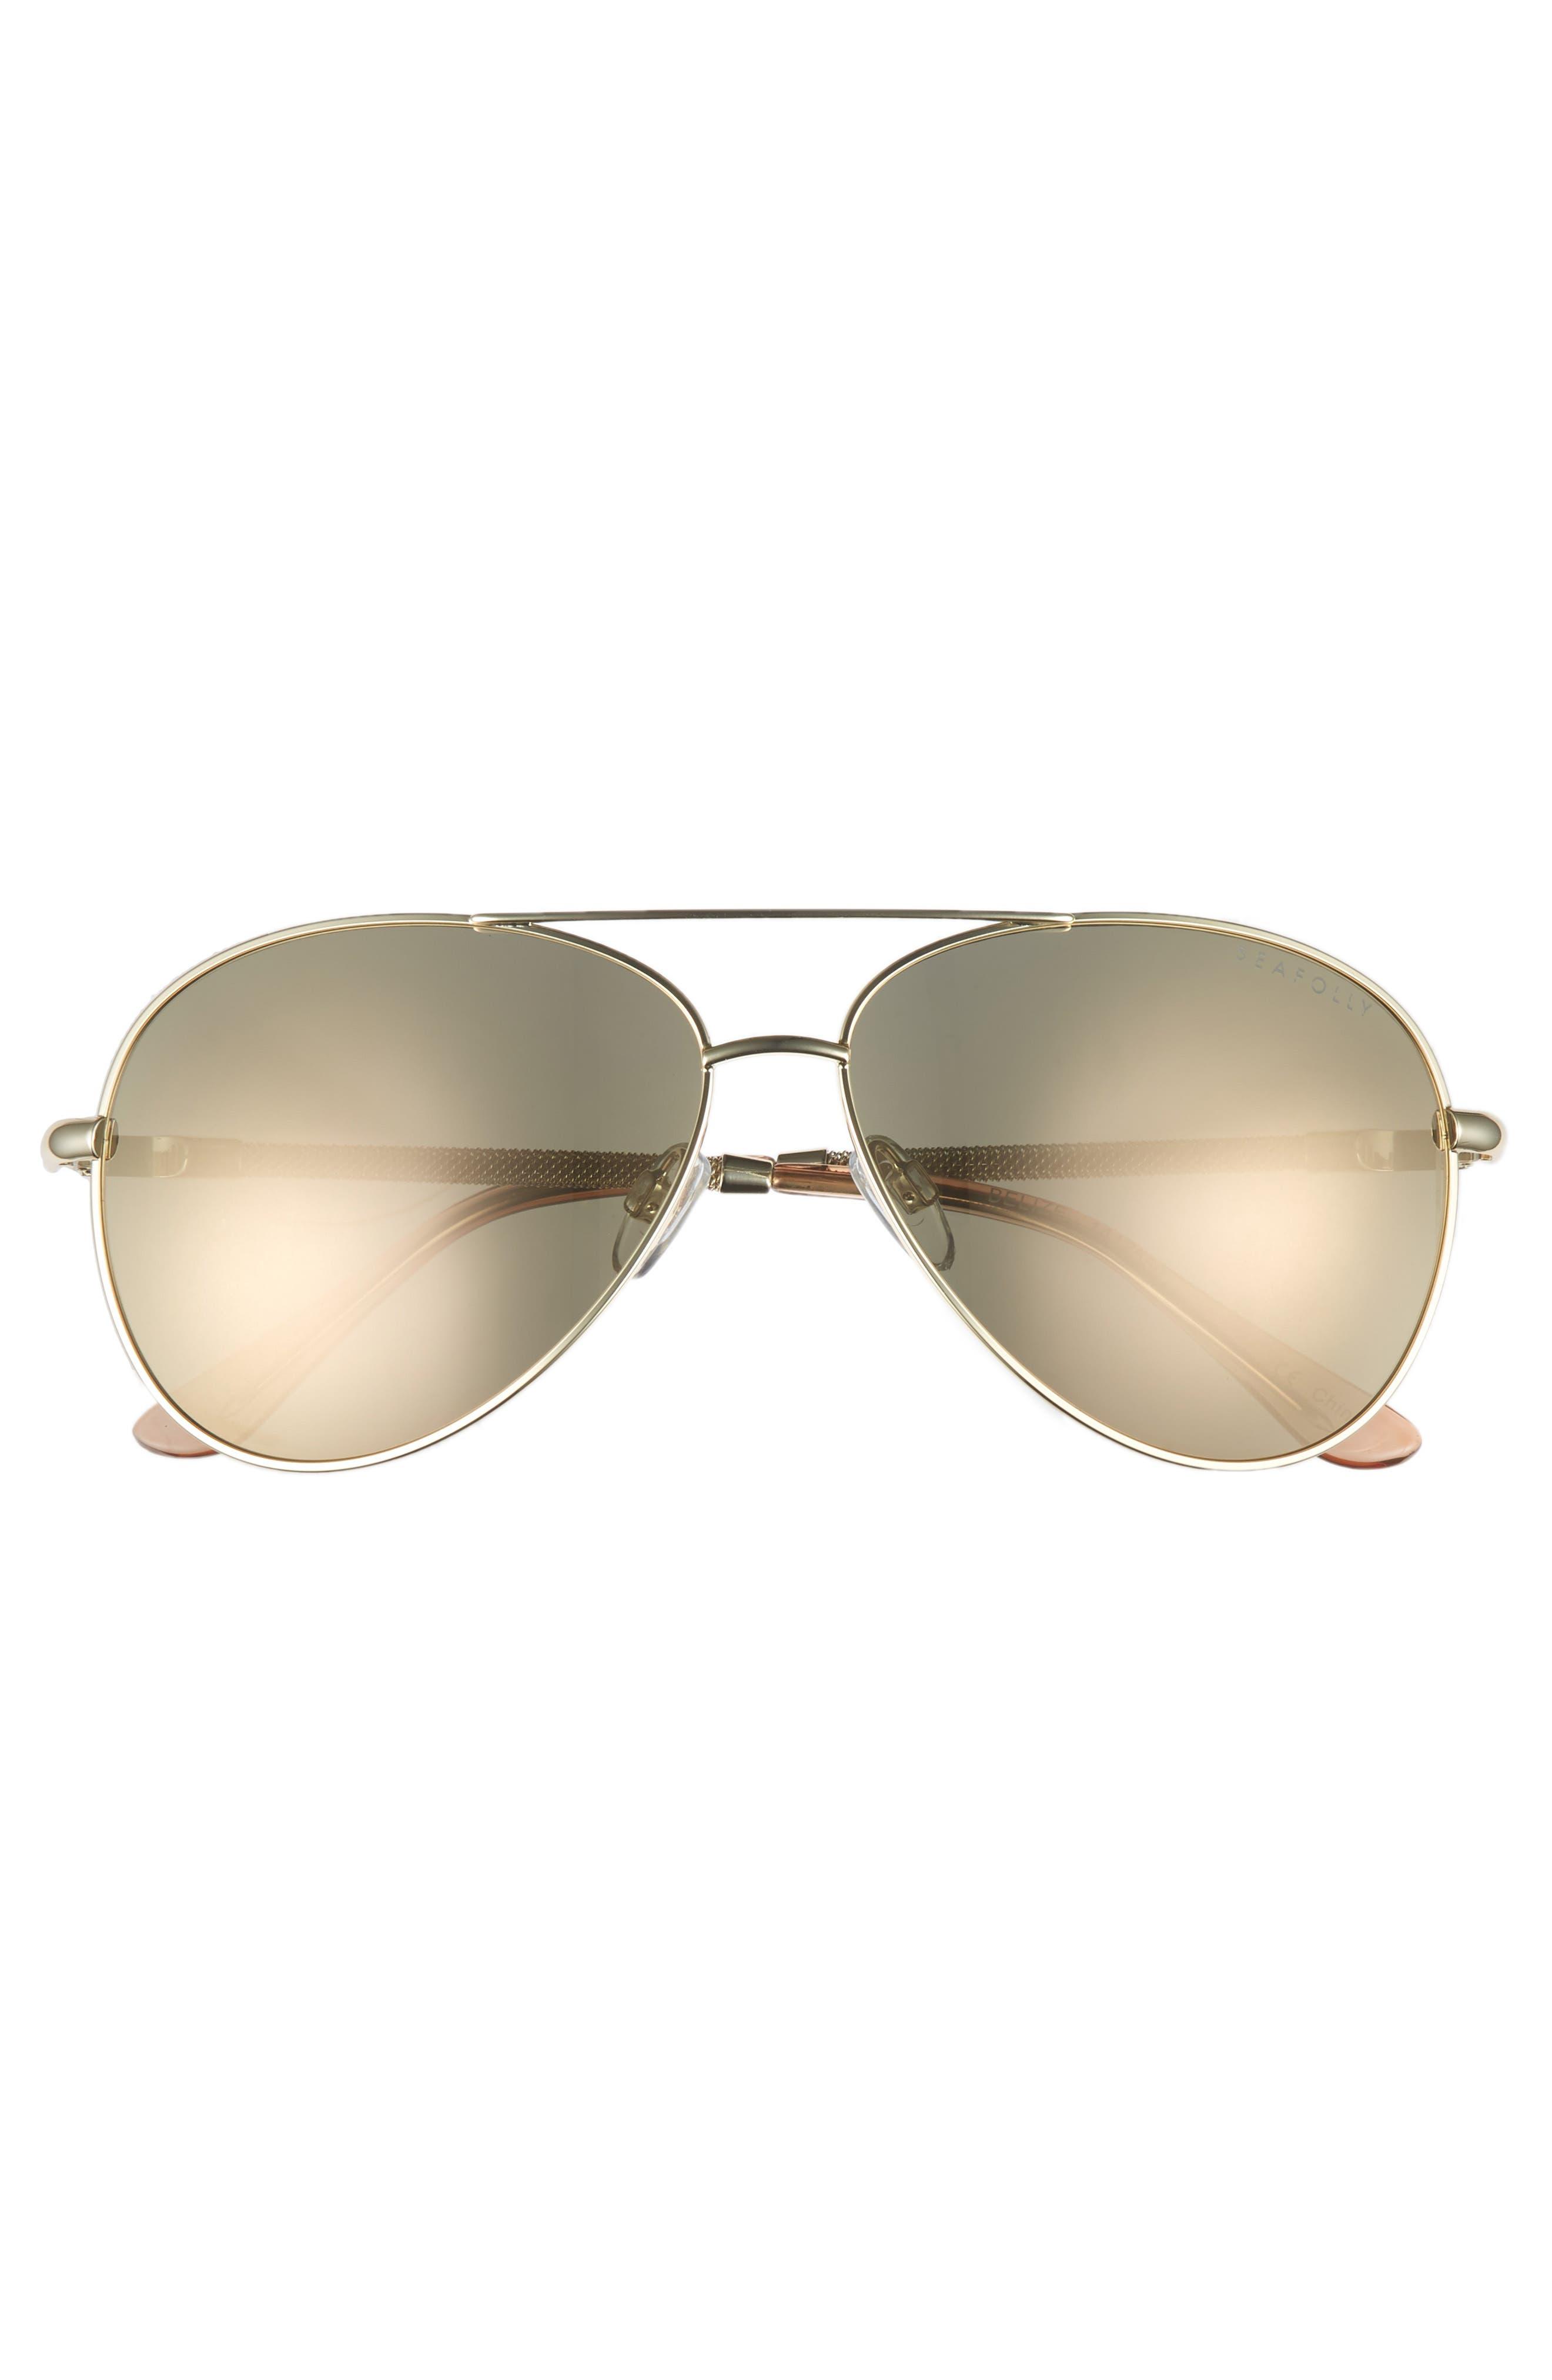 Belize 59mm Aviator Sunglasses,                             Alternate thumbnail 3, color,                             710